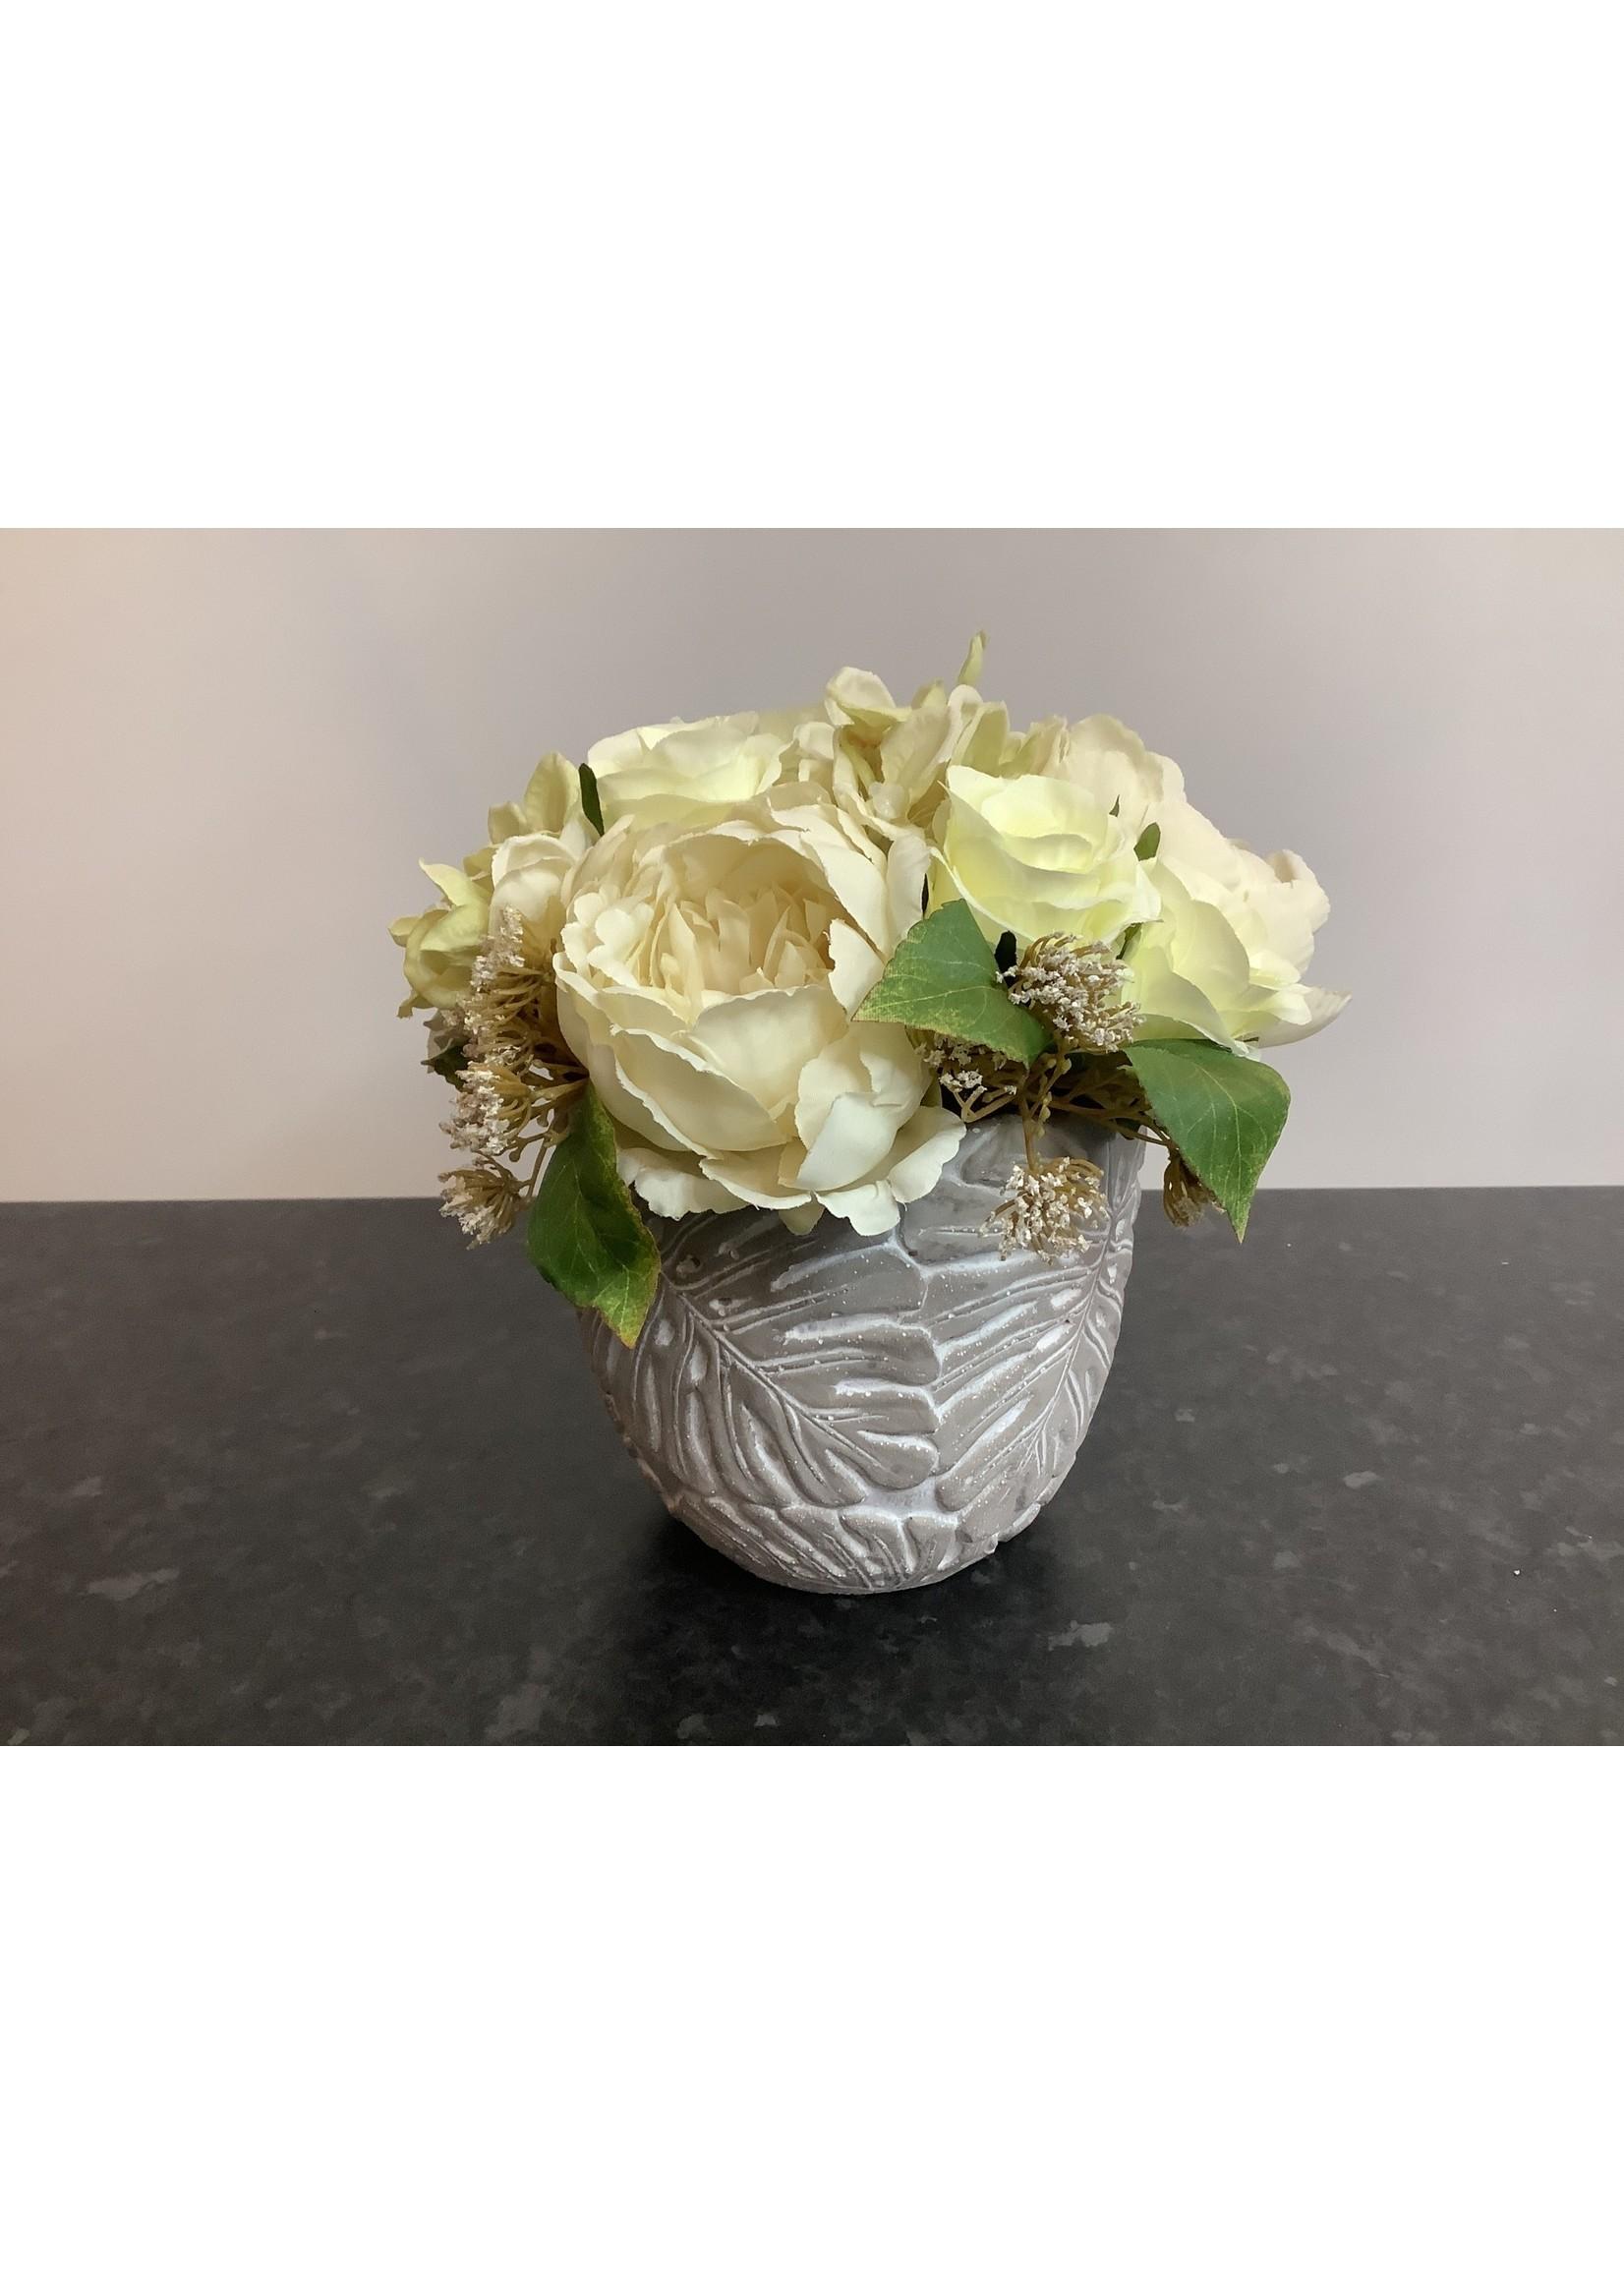 Vintage rose and peony  arrangement 16x20cm